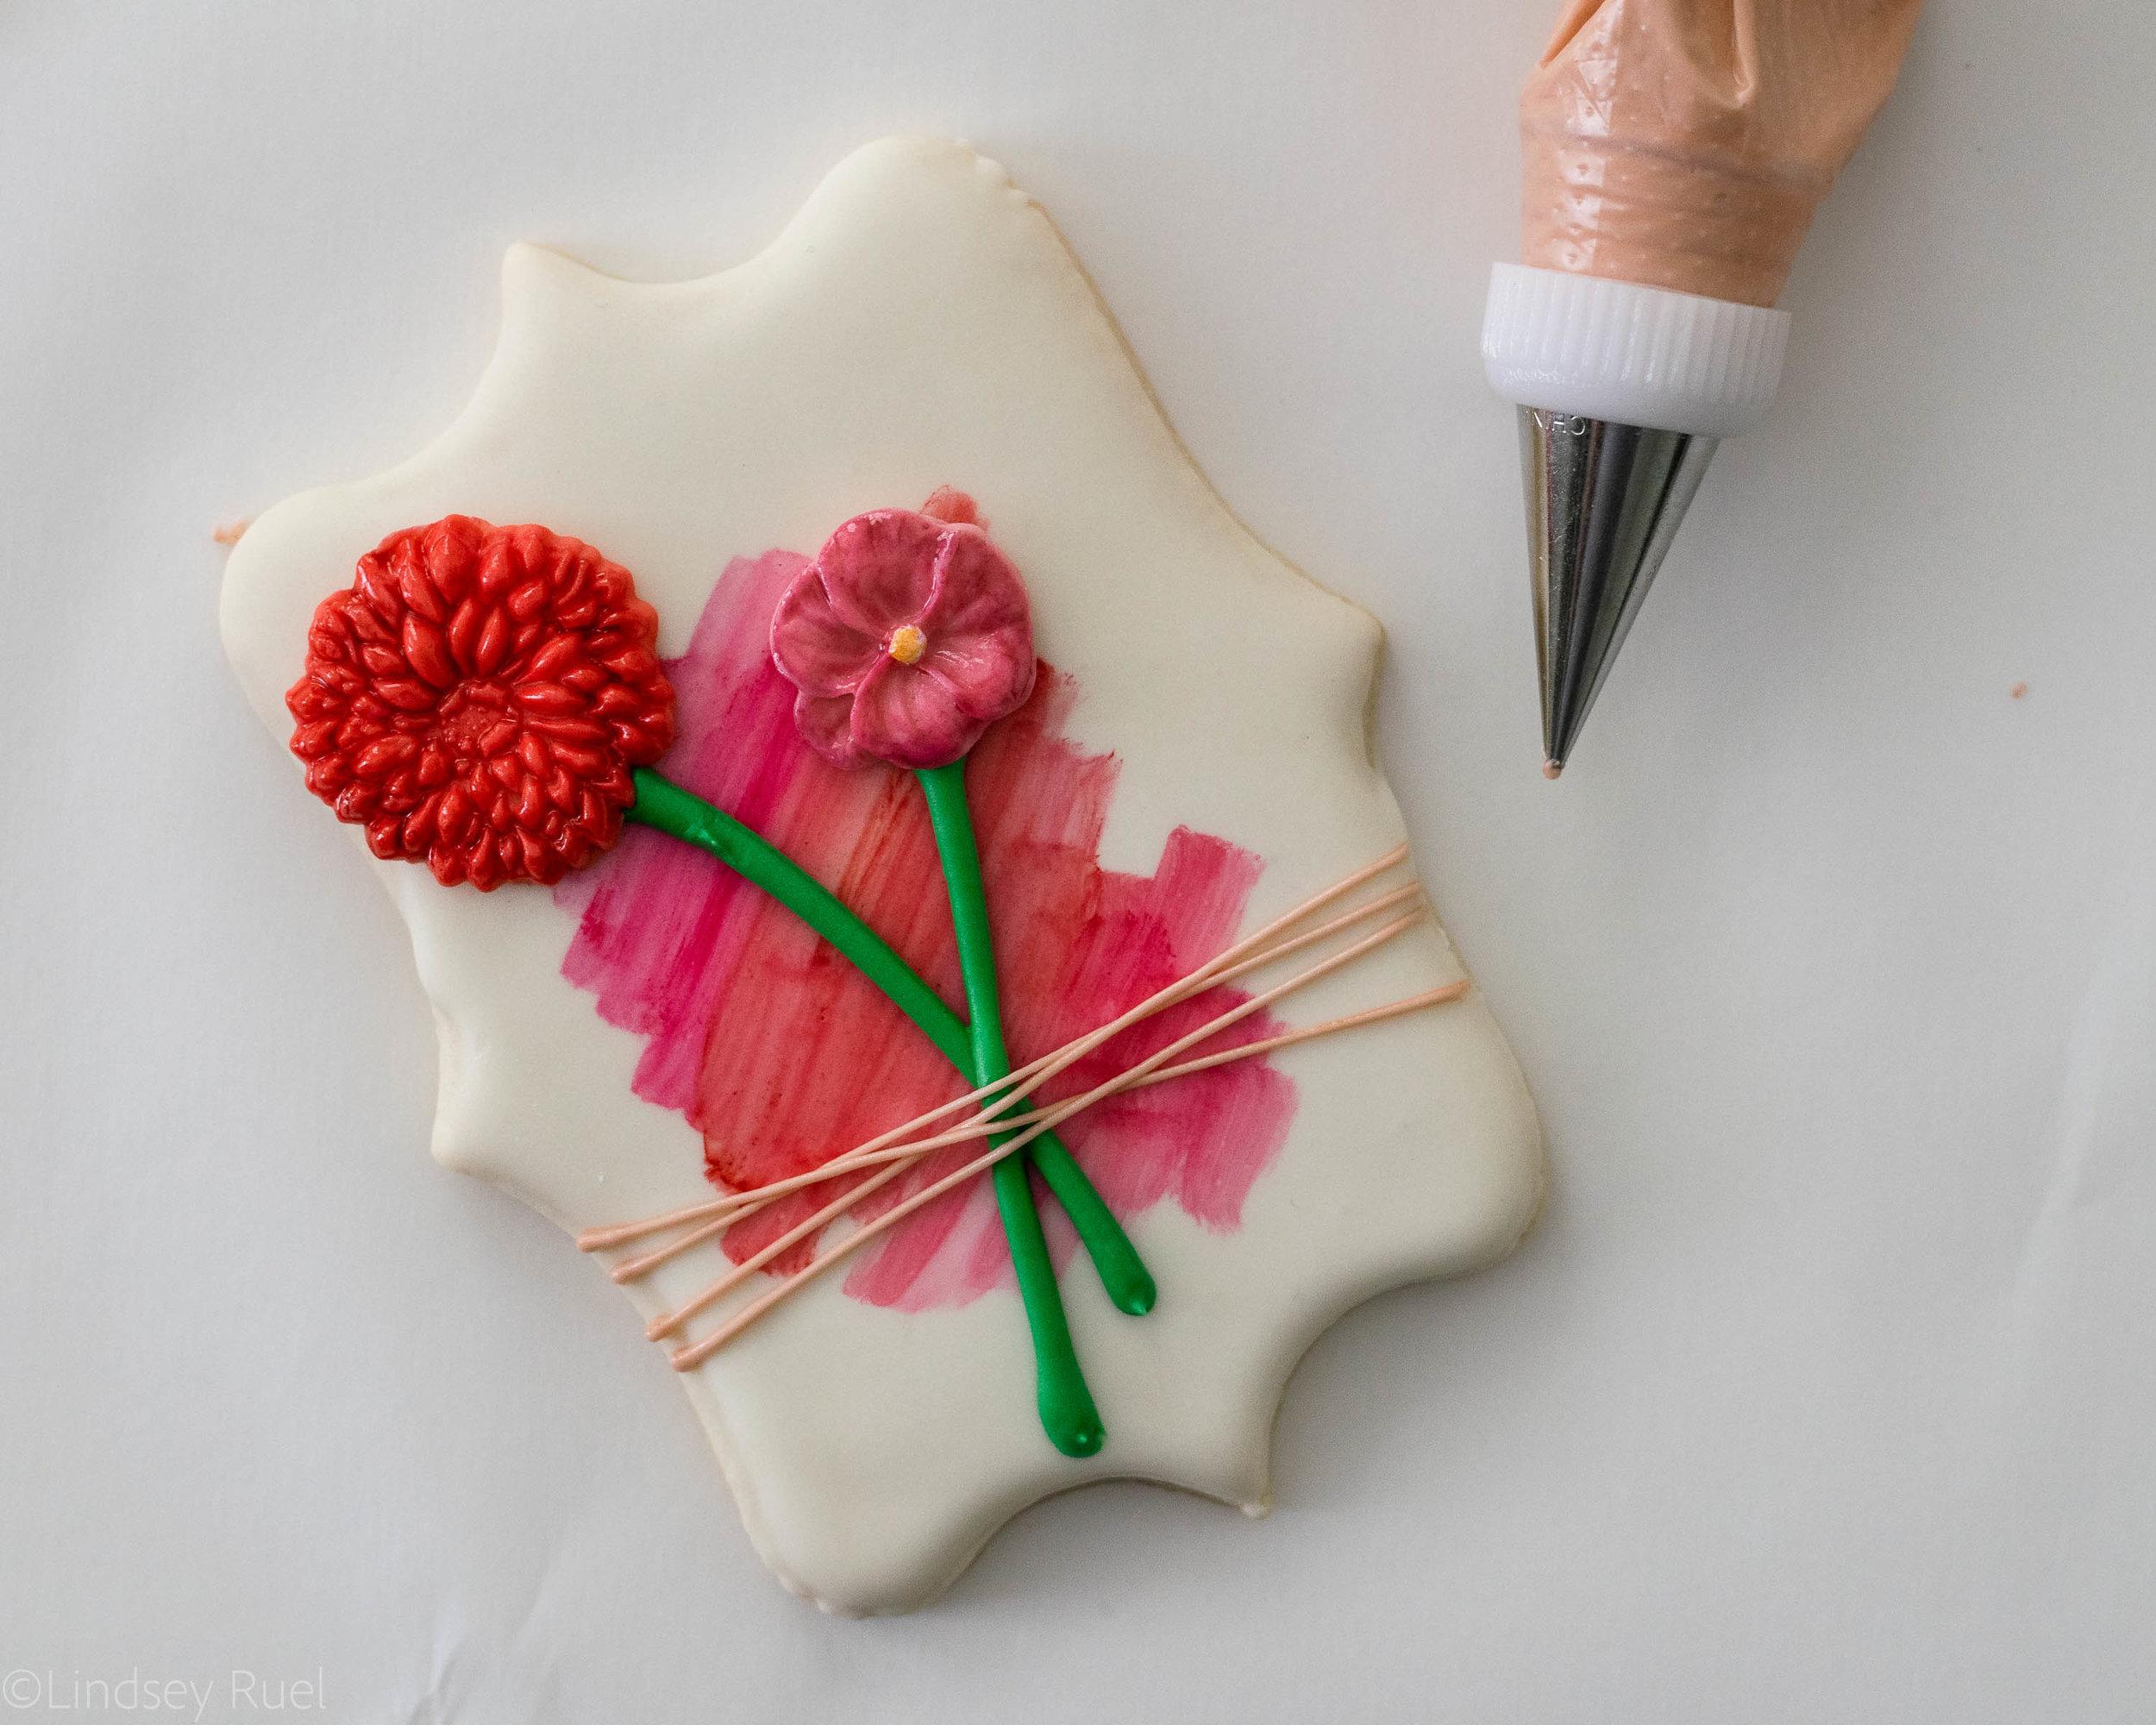 Fondant-Flower-Stem-Cookies-7.jpg